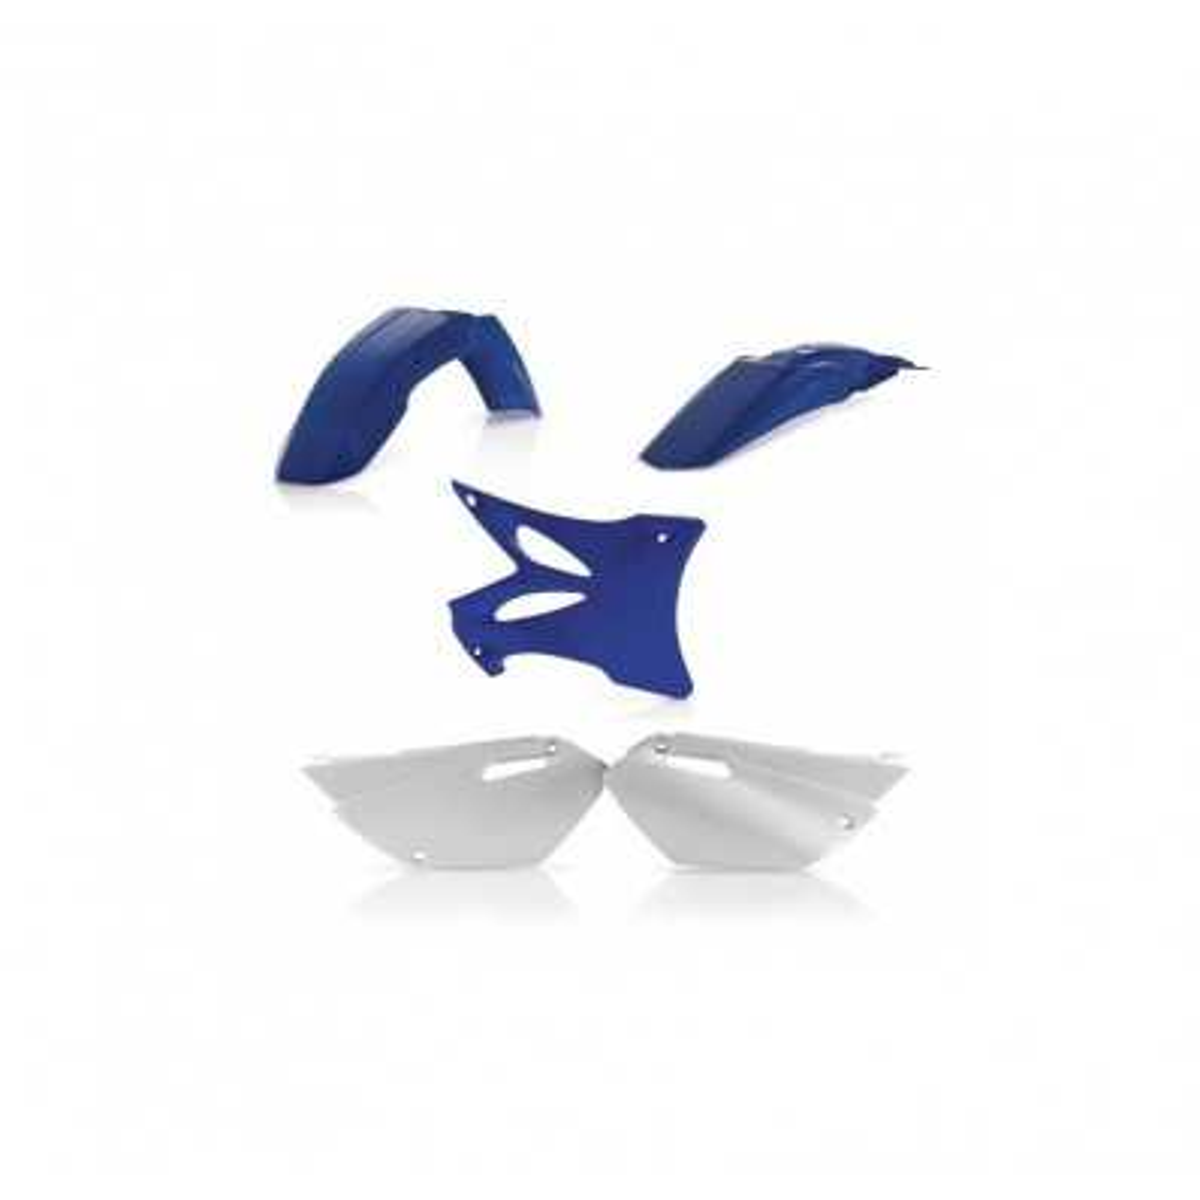 0023089-553 - Kit Plasticos Wrf 250 18 Origen